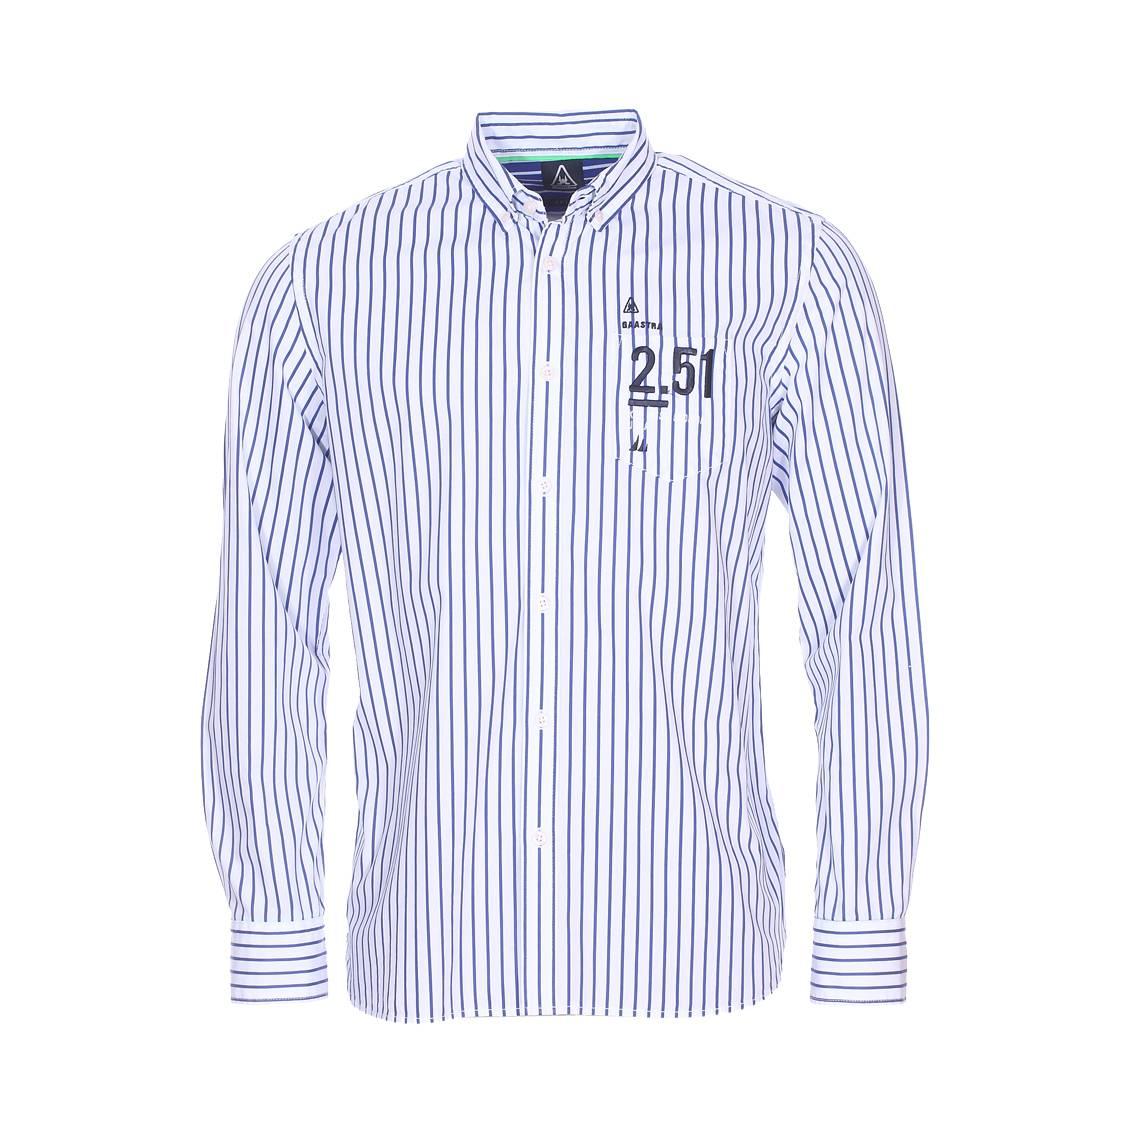 chemise droite gaastra en coton blanc rayures bleu roi rue des hommes. Black Bedroom Furniture Sets. Home Design Ideas